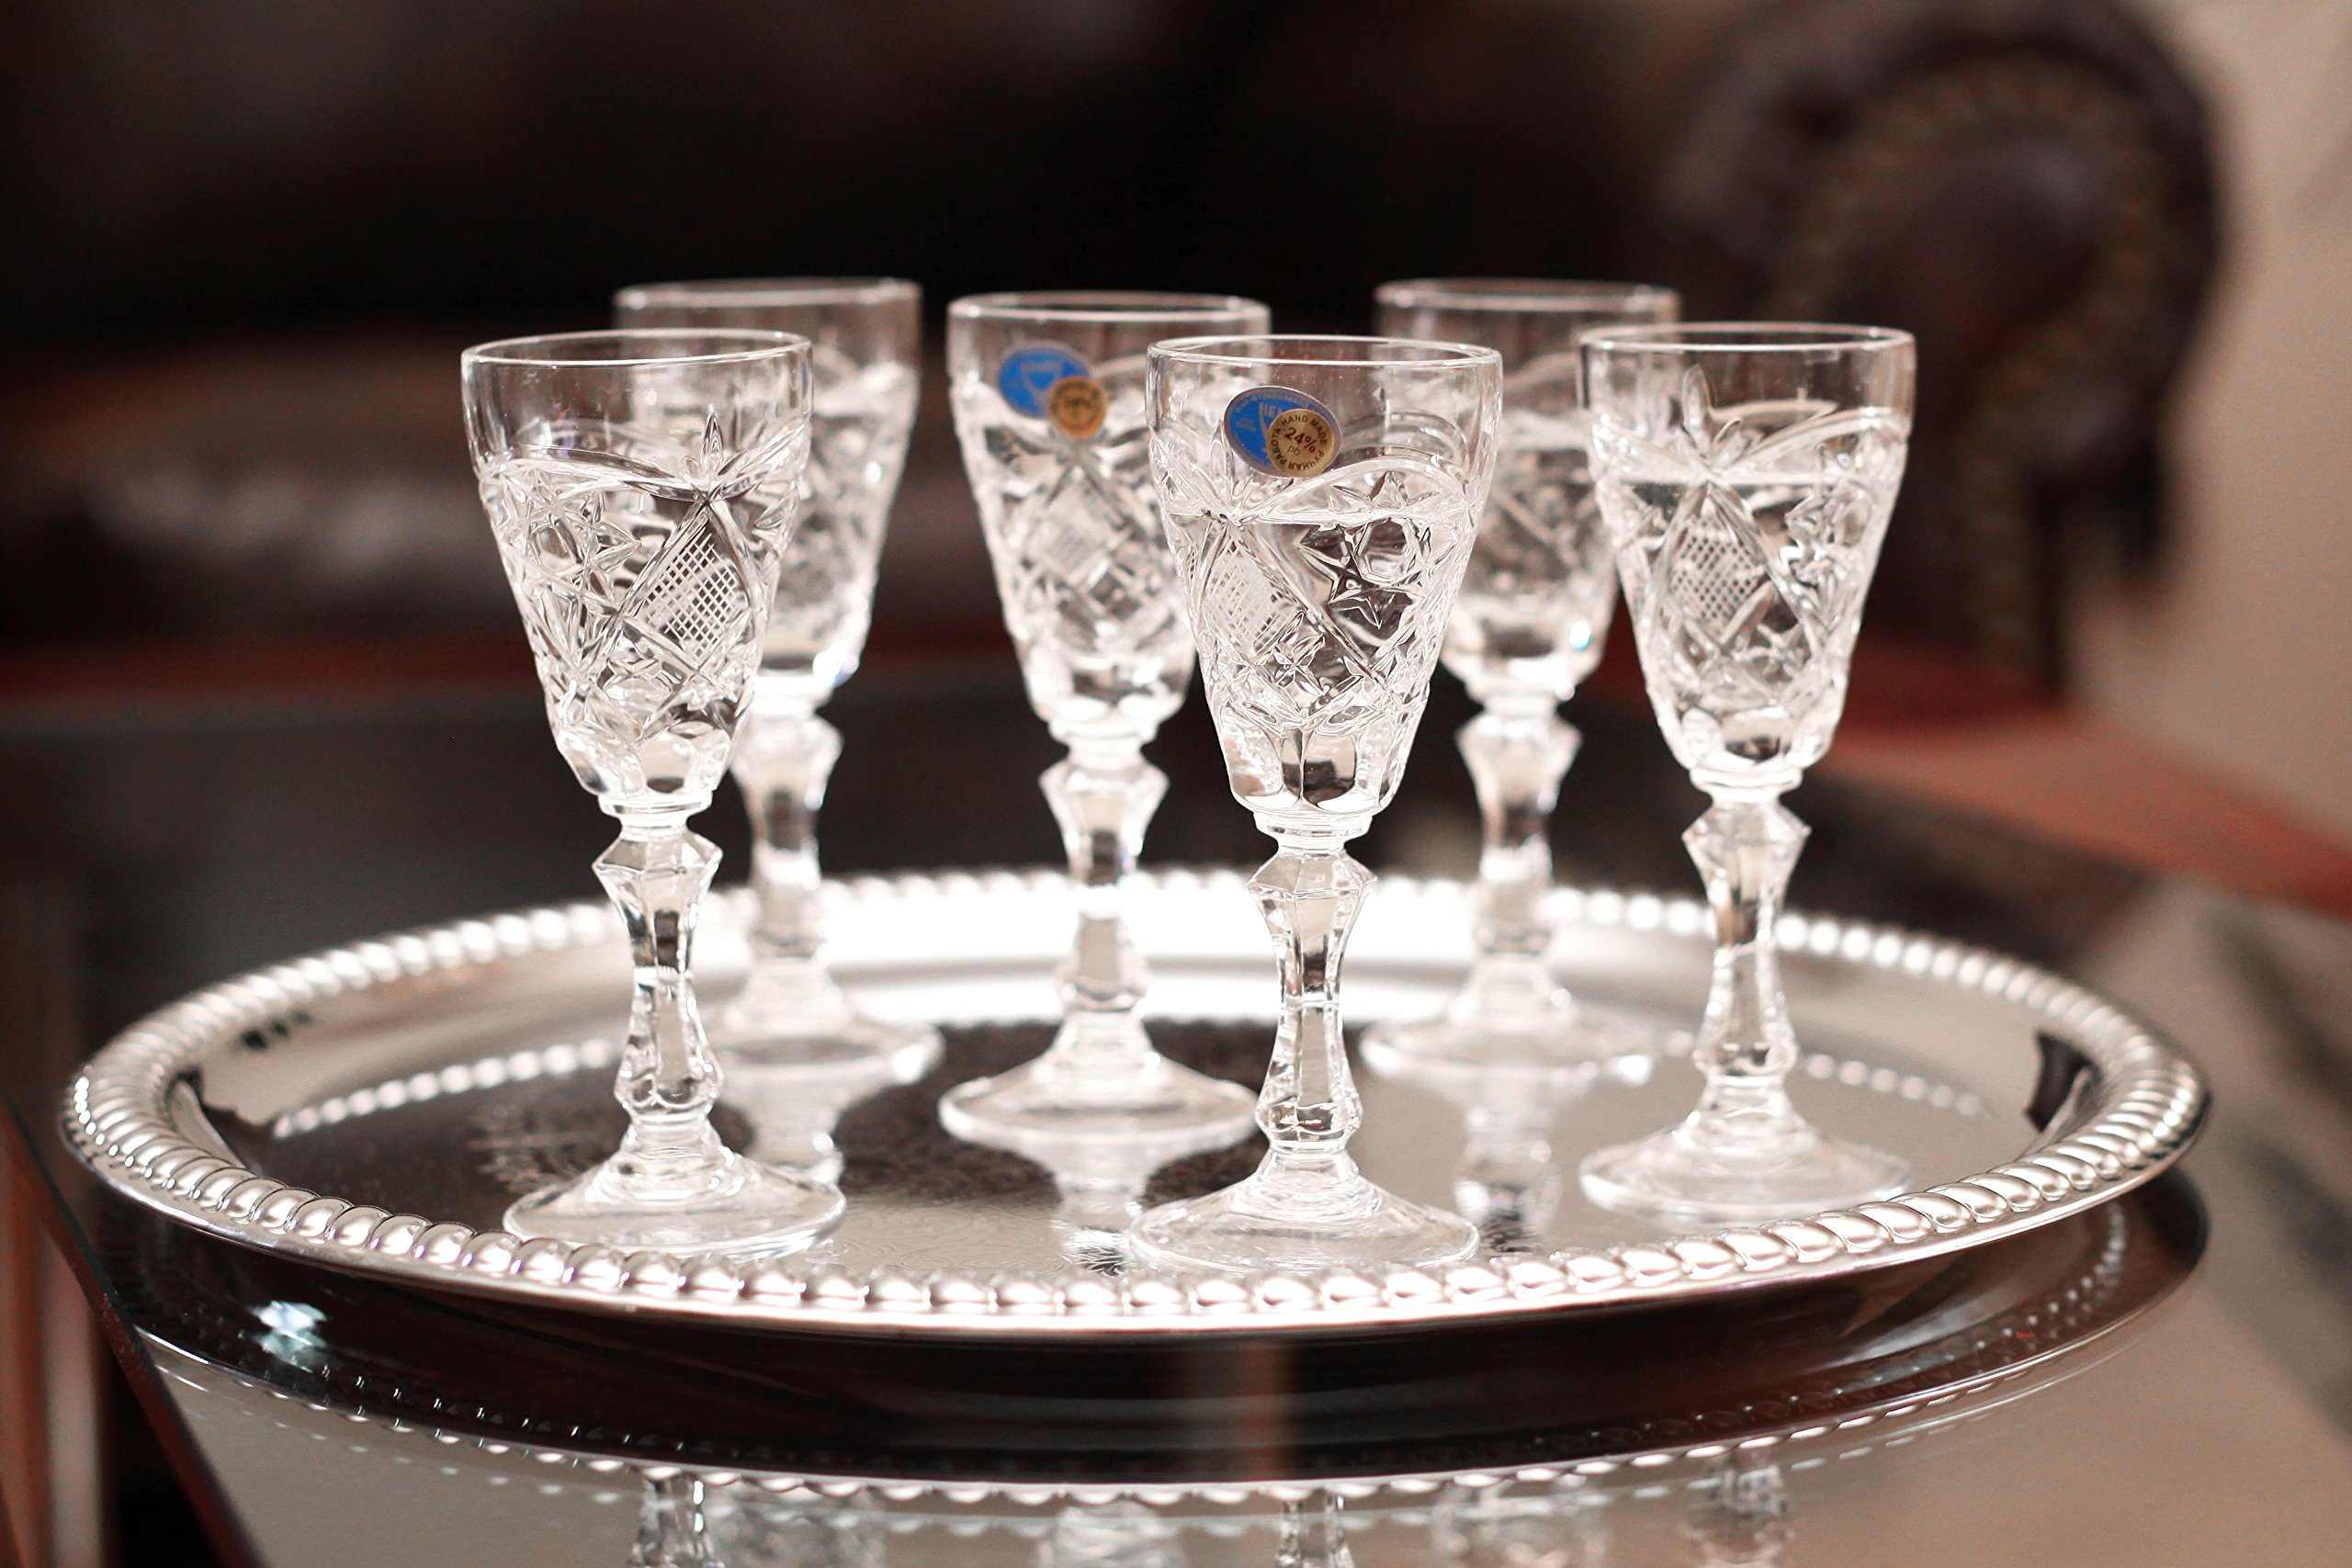 Set of 6 Neman Glassworks, 2-Oz Hand Made Vintage Russian Crystal Glasses, Liquor Glasses Old-fashioned Glassware